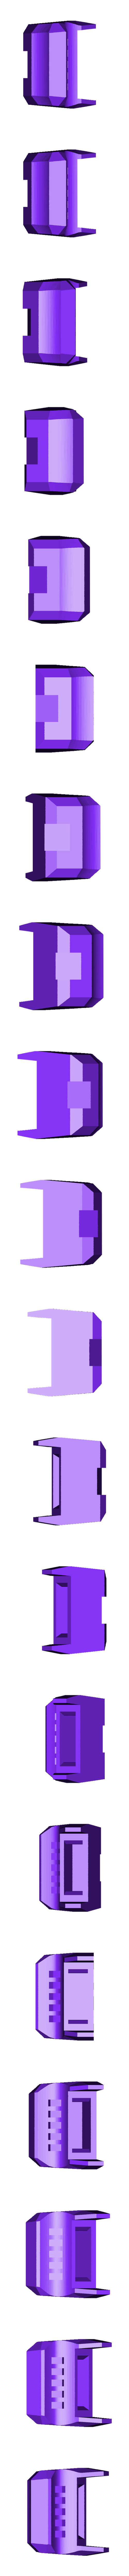 LegT2_Left_Foot_15_OliveGreen.stl Download STL file Heavy Gun Walker • 3D print design, Jwoong